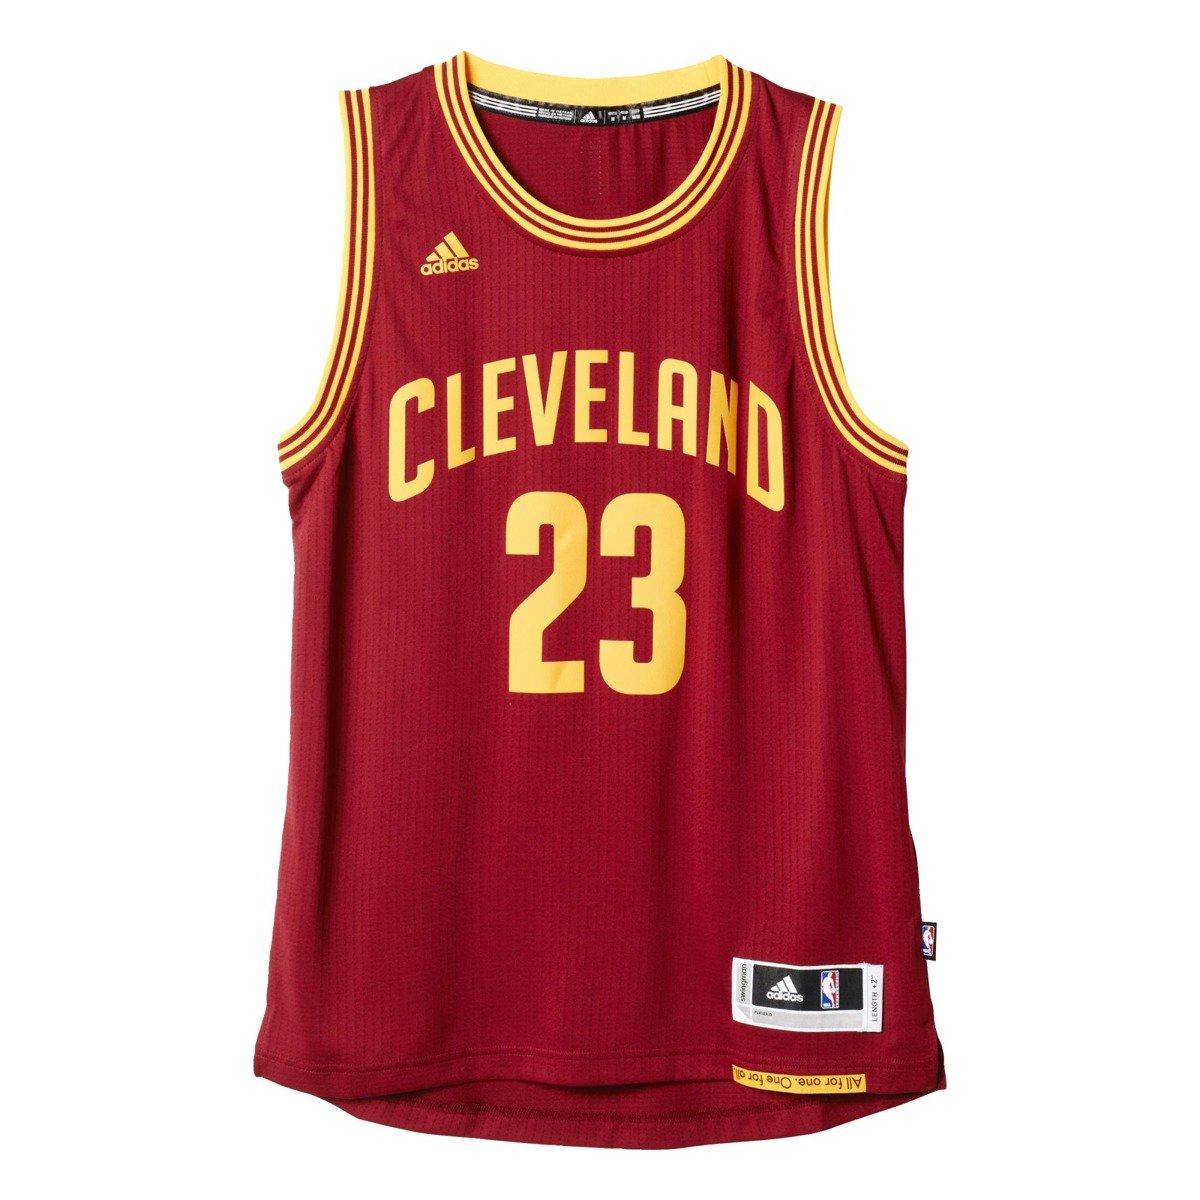 Cleveland Cavaliers Kids Clothing Buy Cavaliers Kids ...